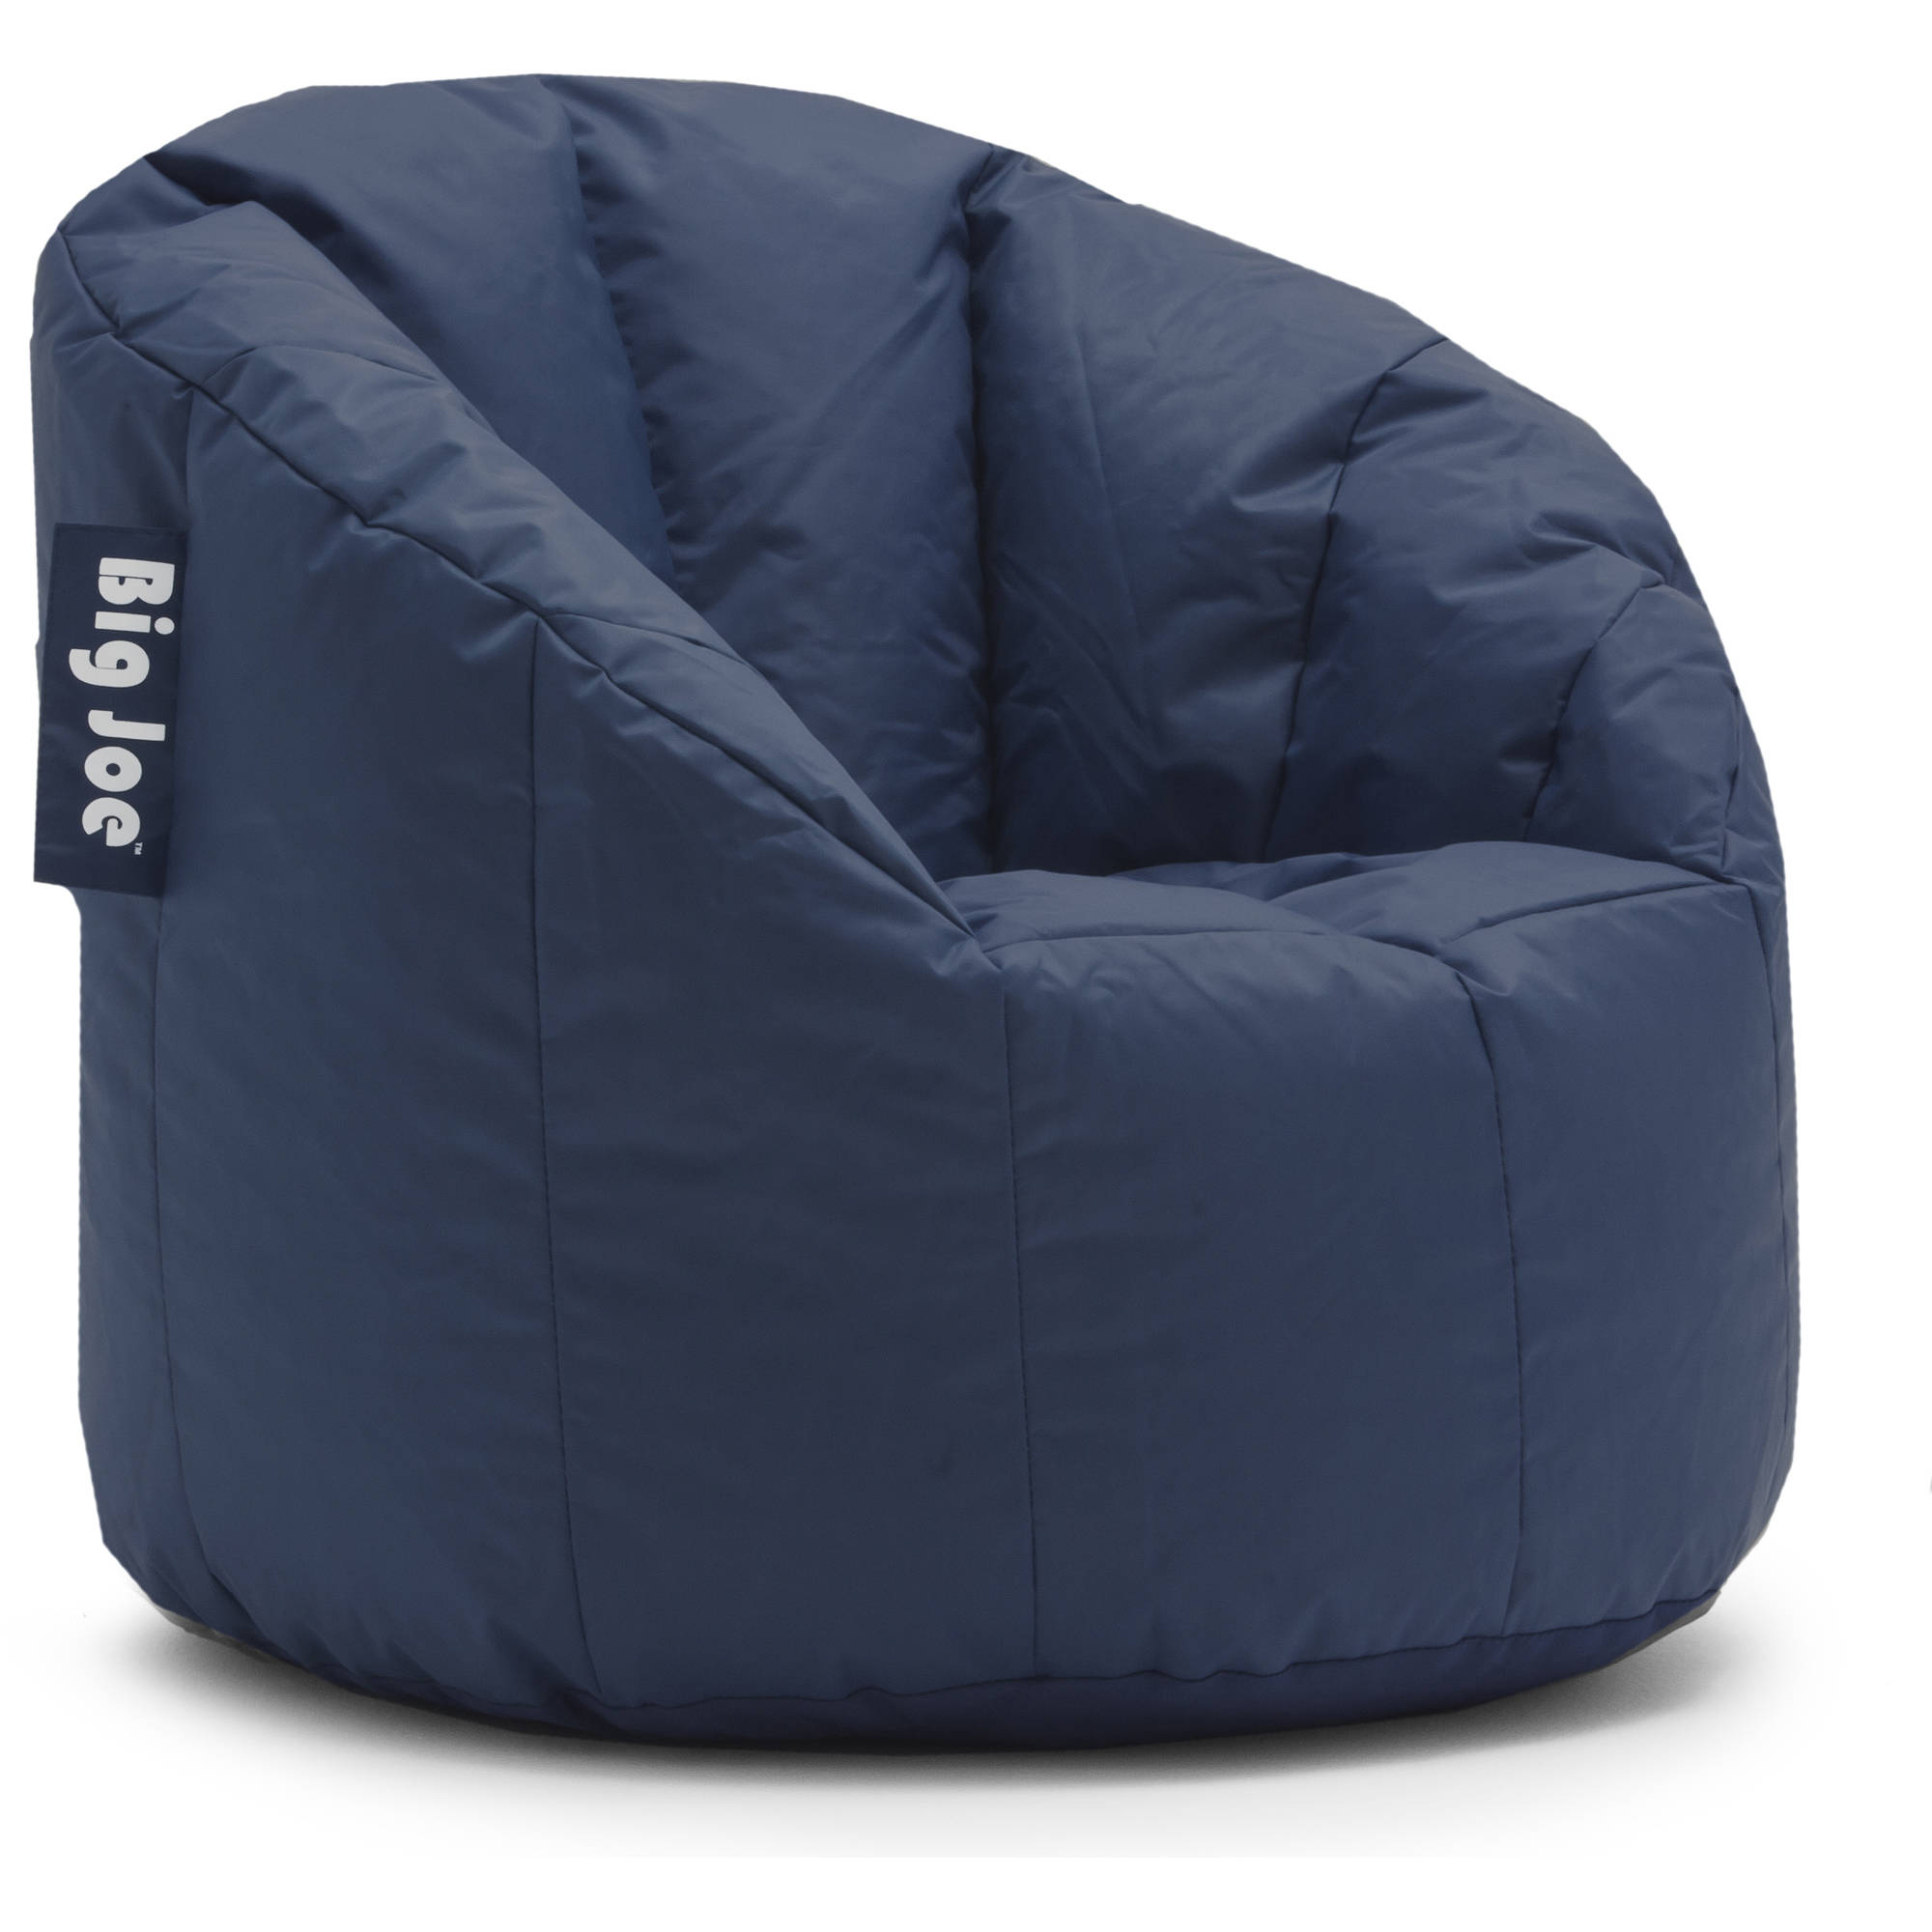 "Big Joe Milano Bean Bag Chair, Multiple Colors - 32"" x 28"" x 25"